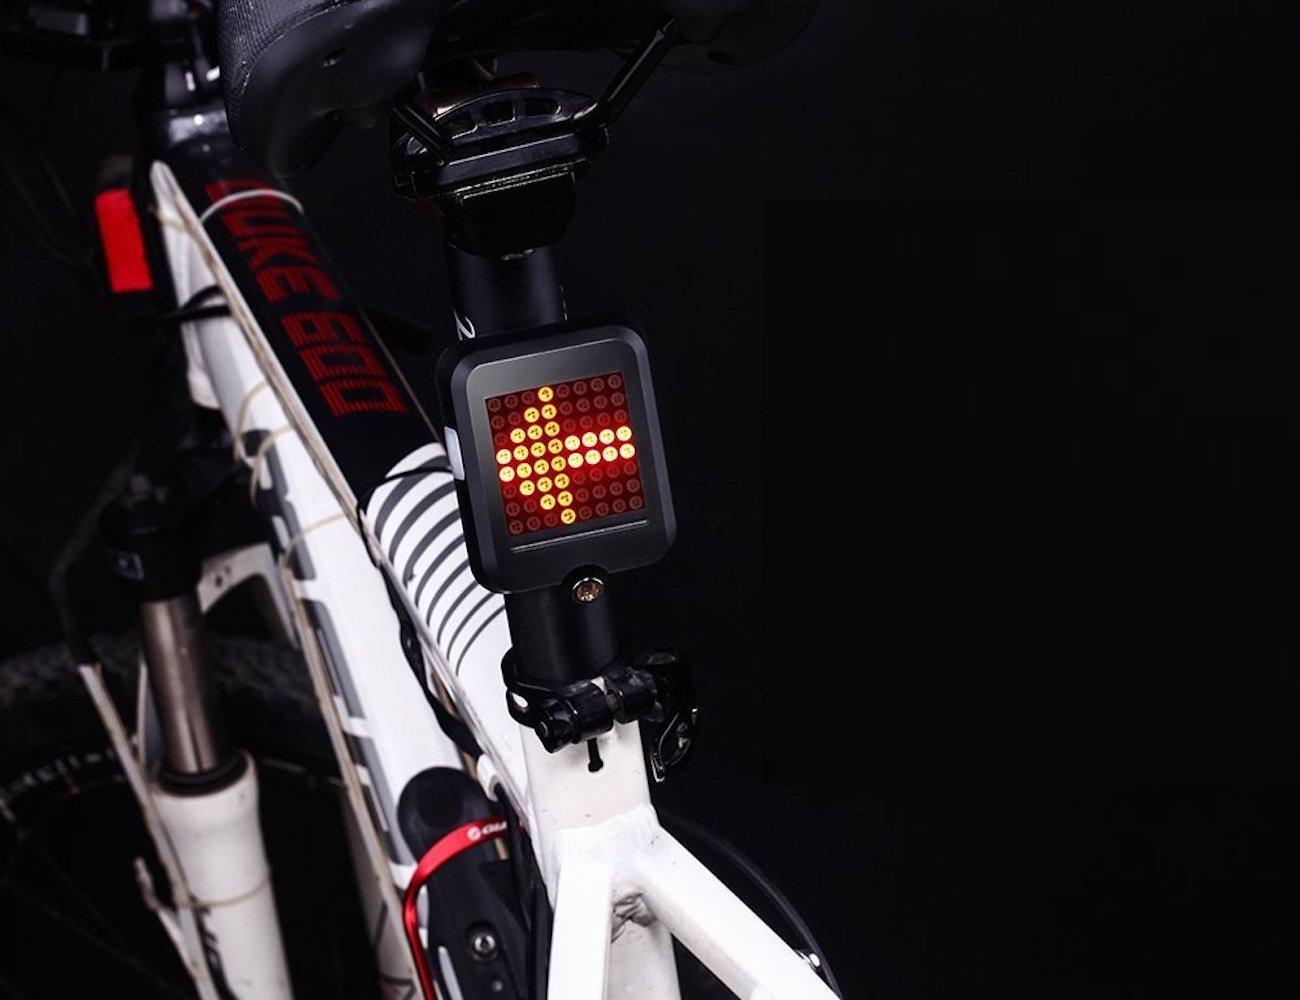 CHFUN Rechargeable Bike Tail Light